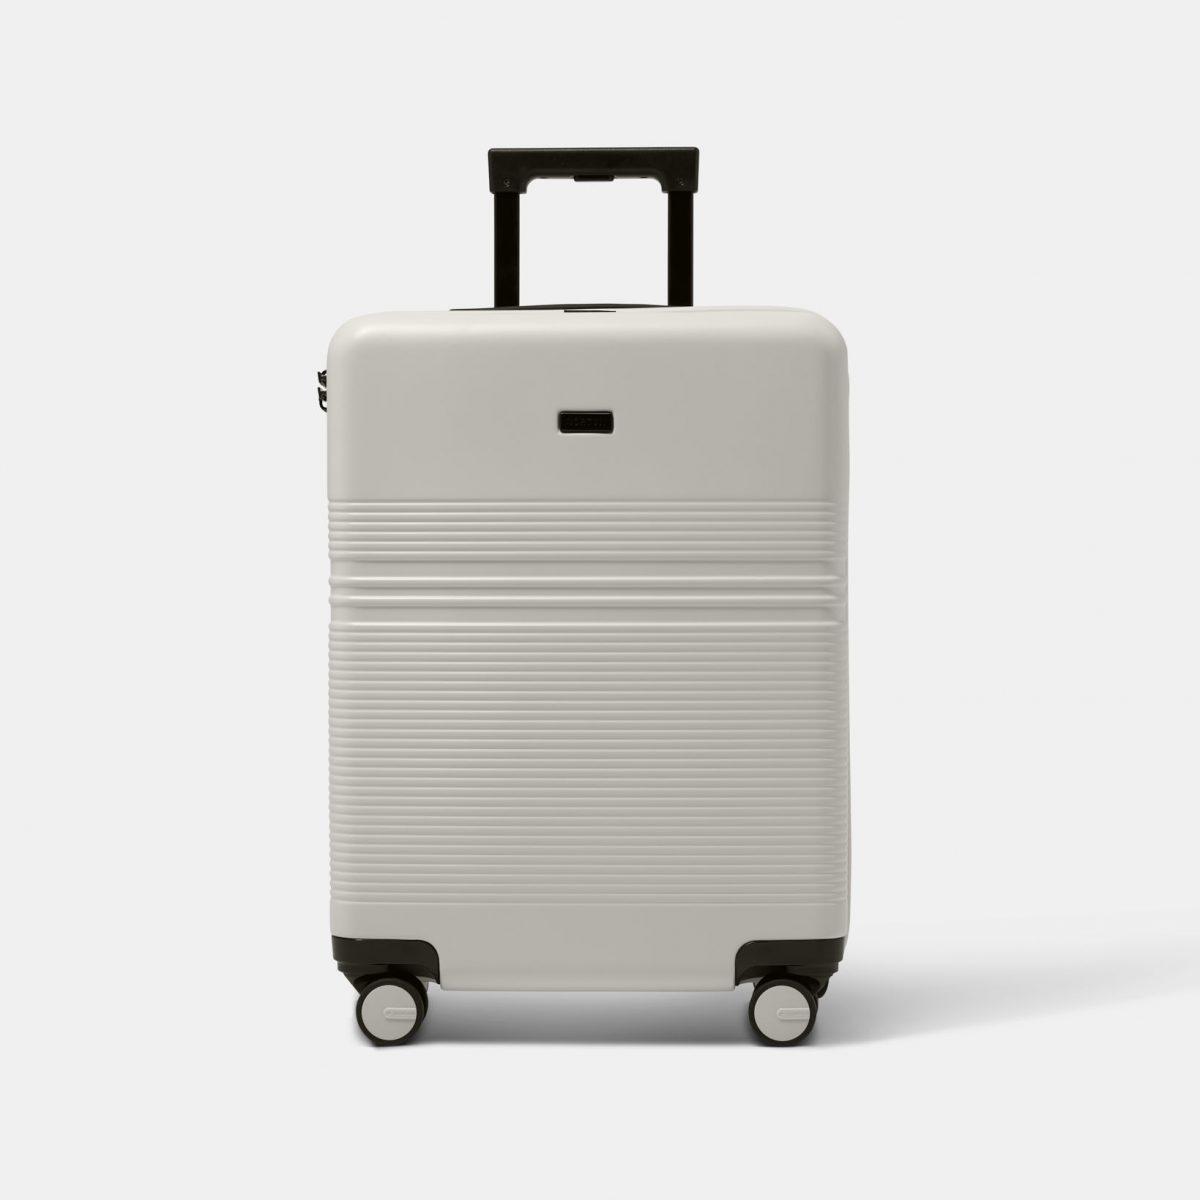 NORTVI sustainable design wit handbagage koffer, trolley suitcase gemaakt van duurzaam materiaal.